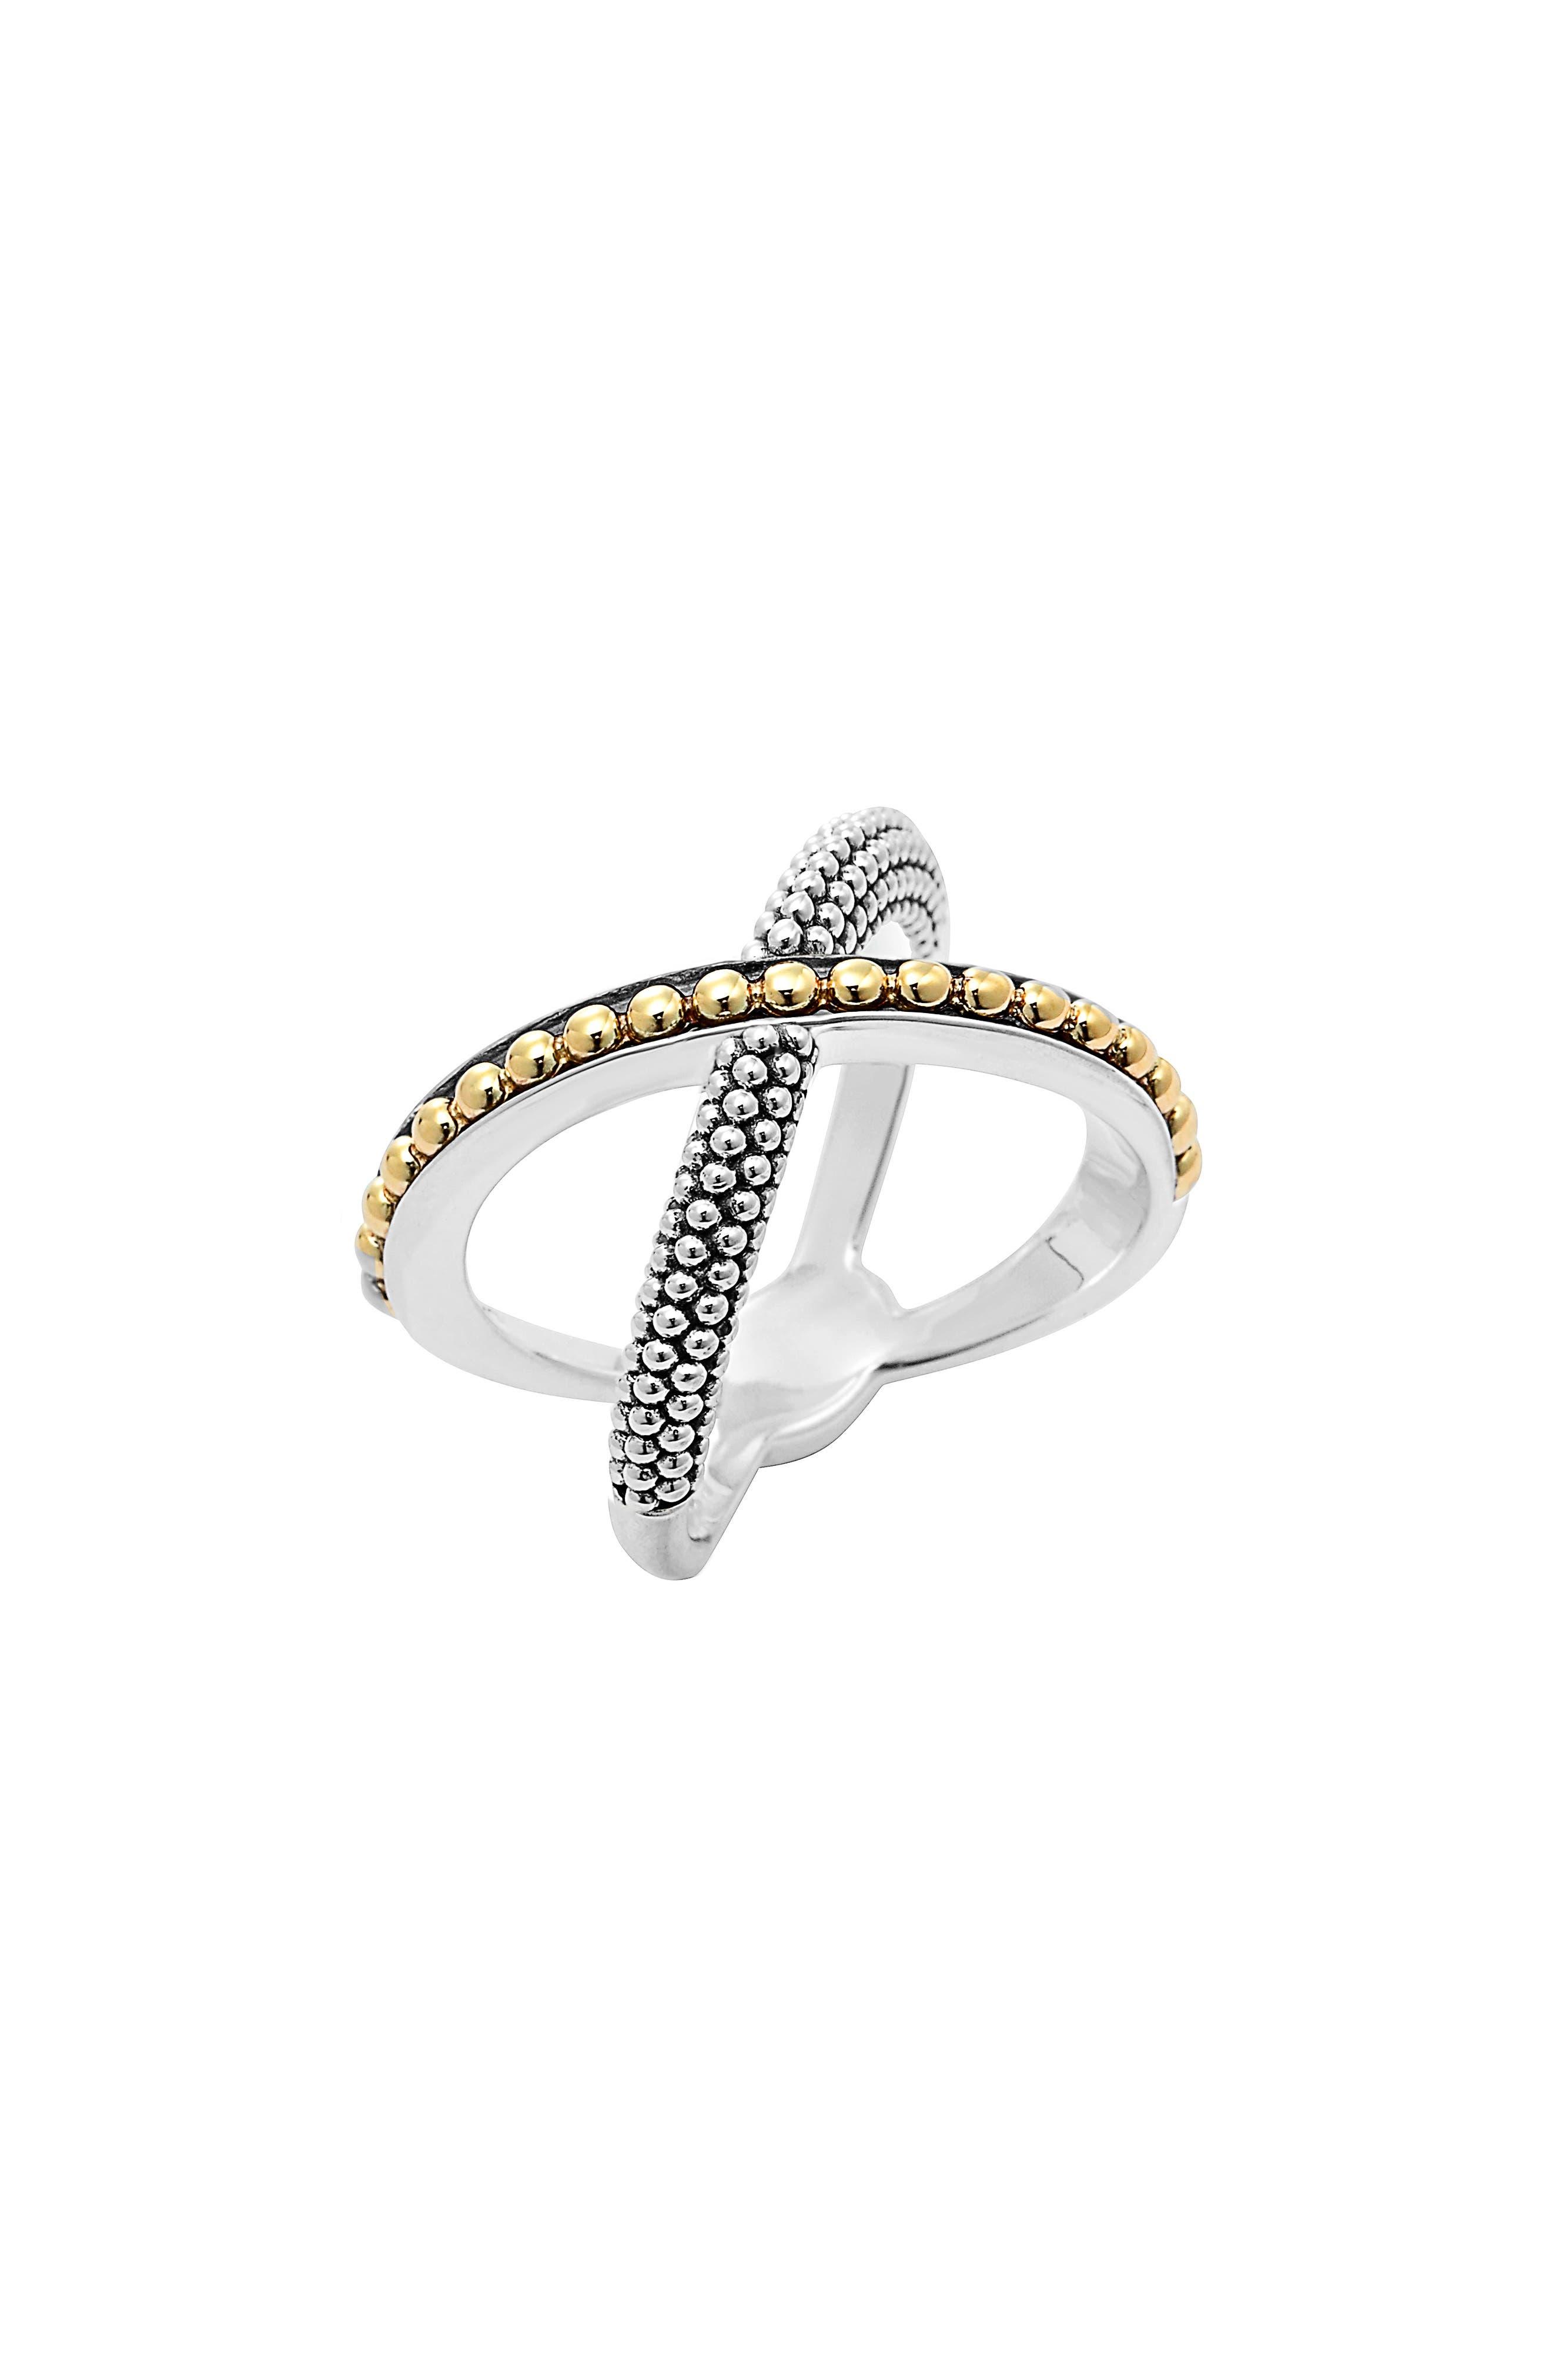 'Enso' Caviar Crossover Ring,                             Main thumbnail 1, color,                             SILVER/ GOLD